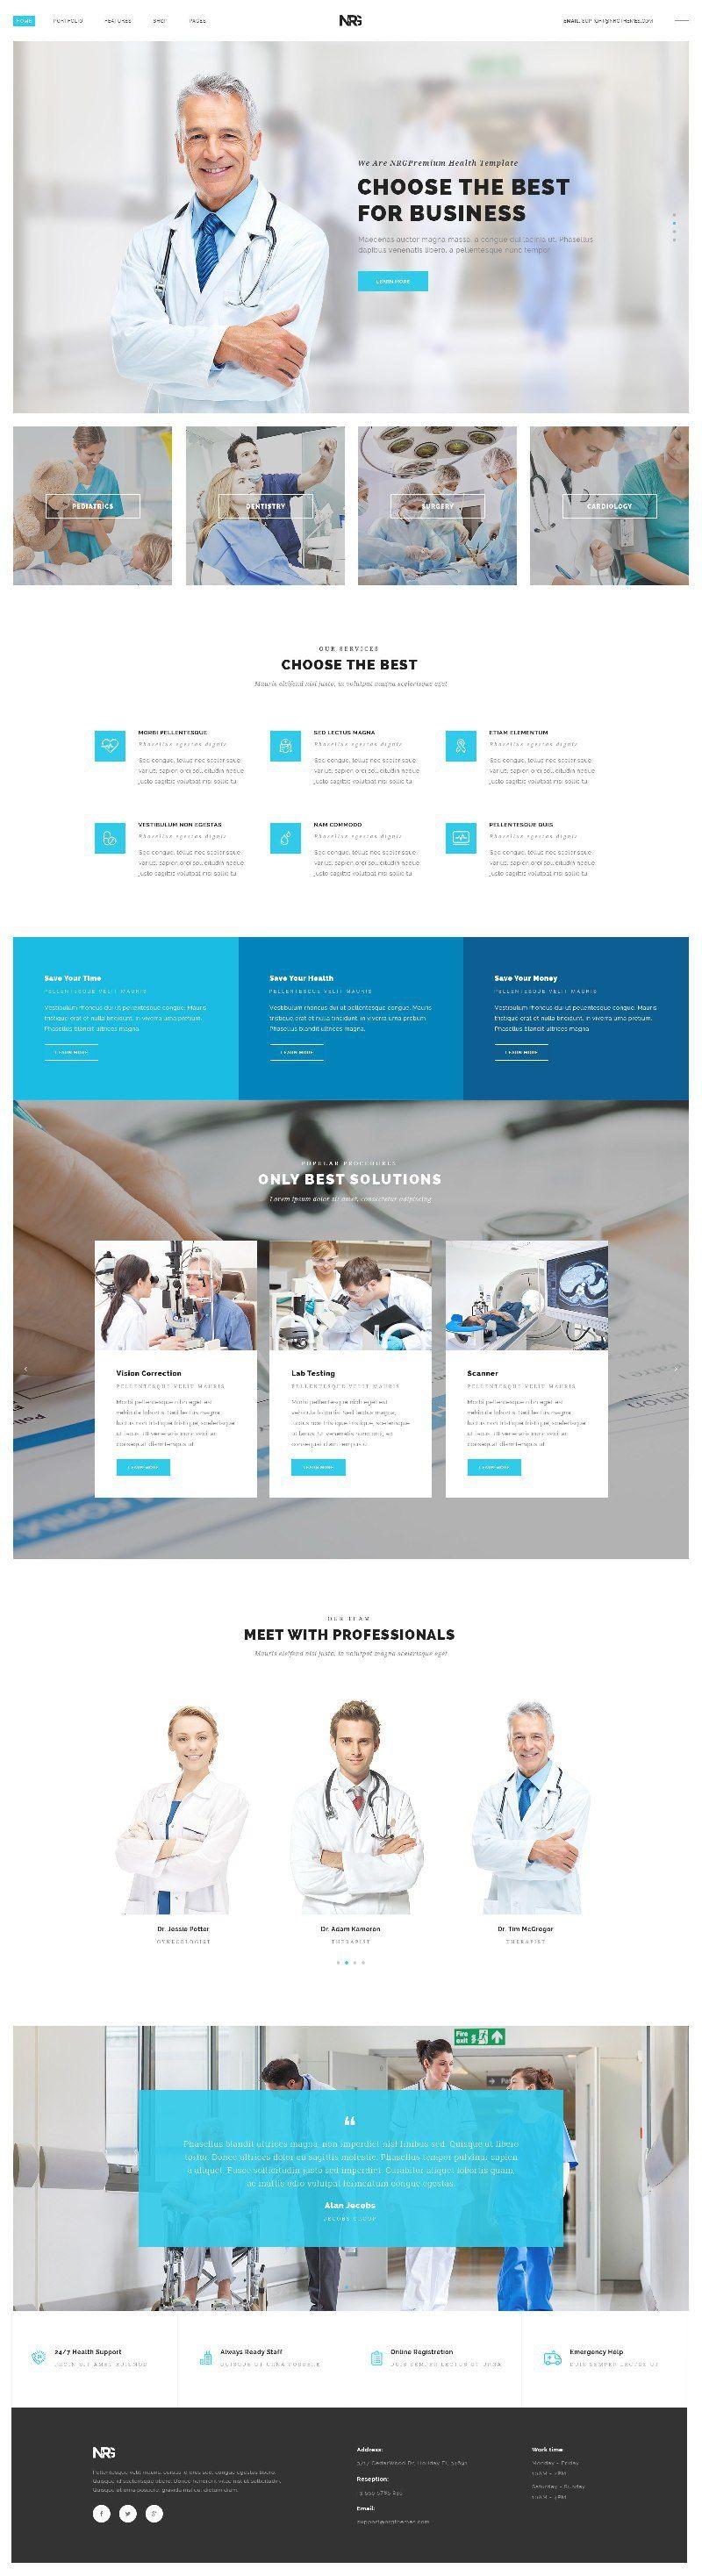 Web Design Inspiration from NRG part 2 4